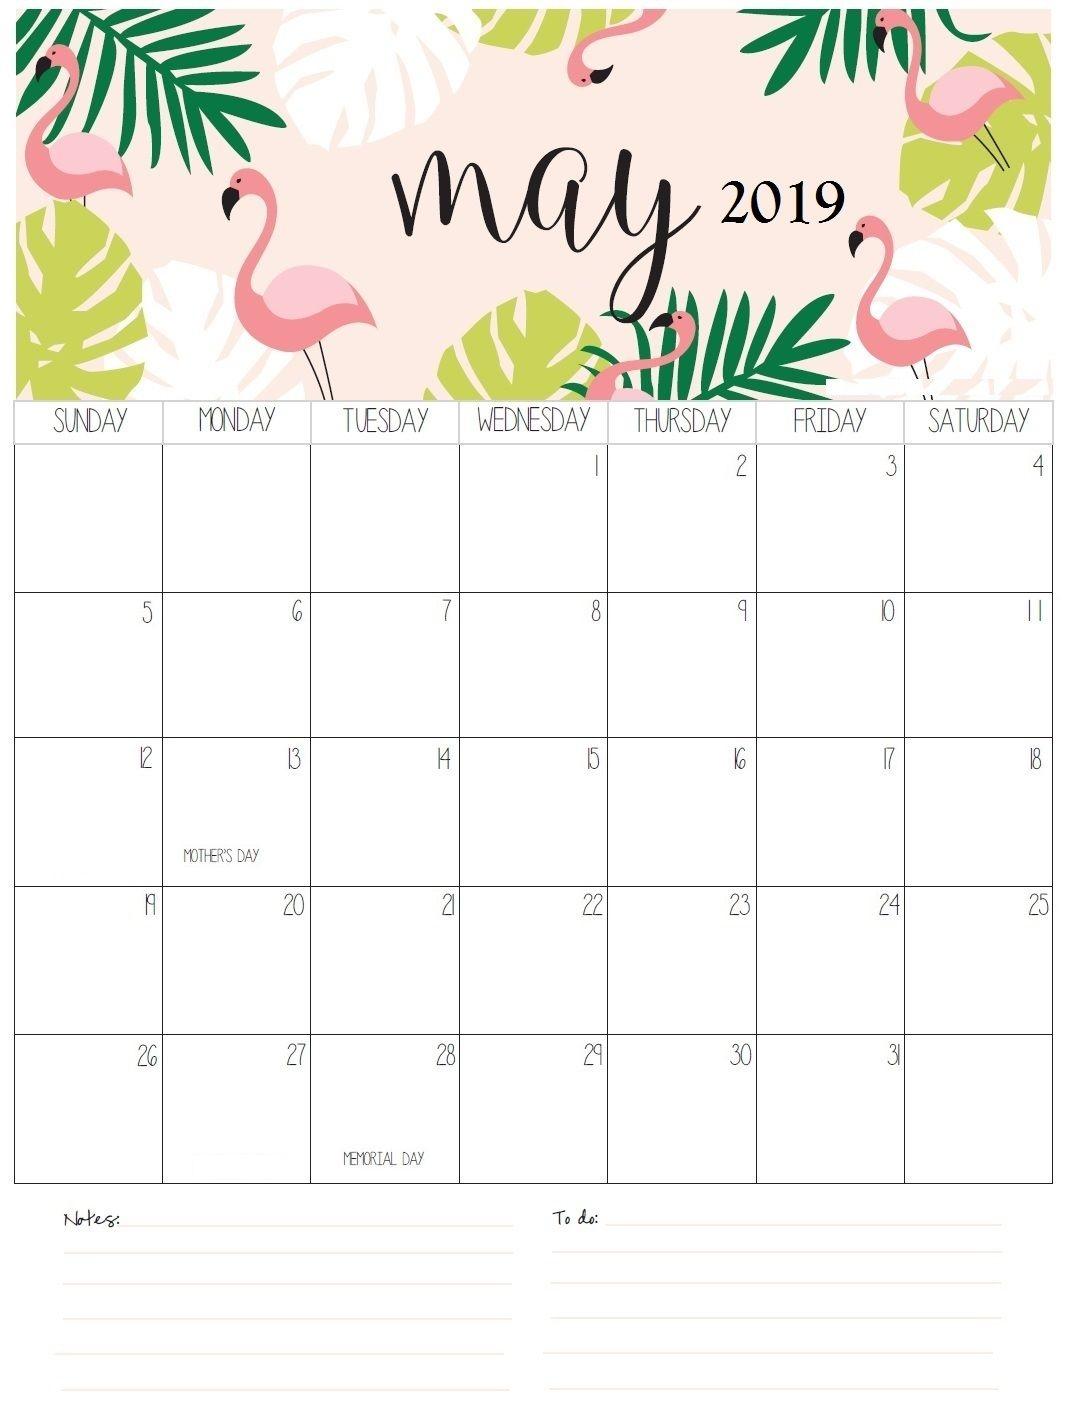 May 2019 Calendar Designs